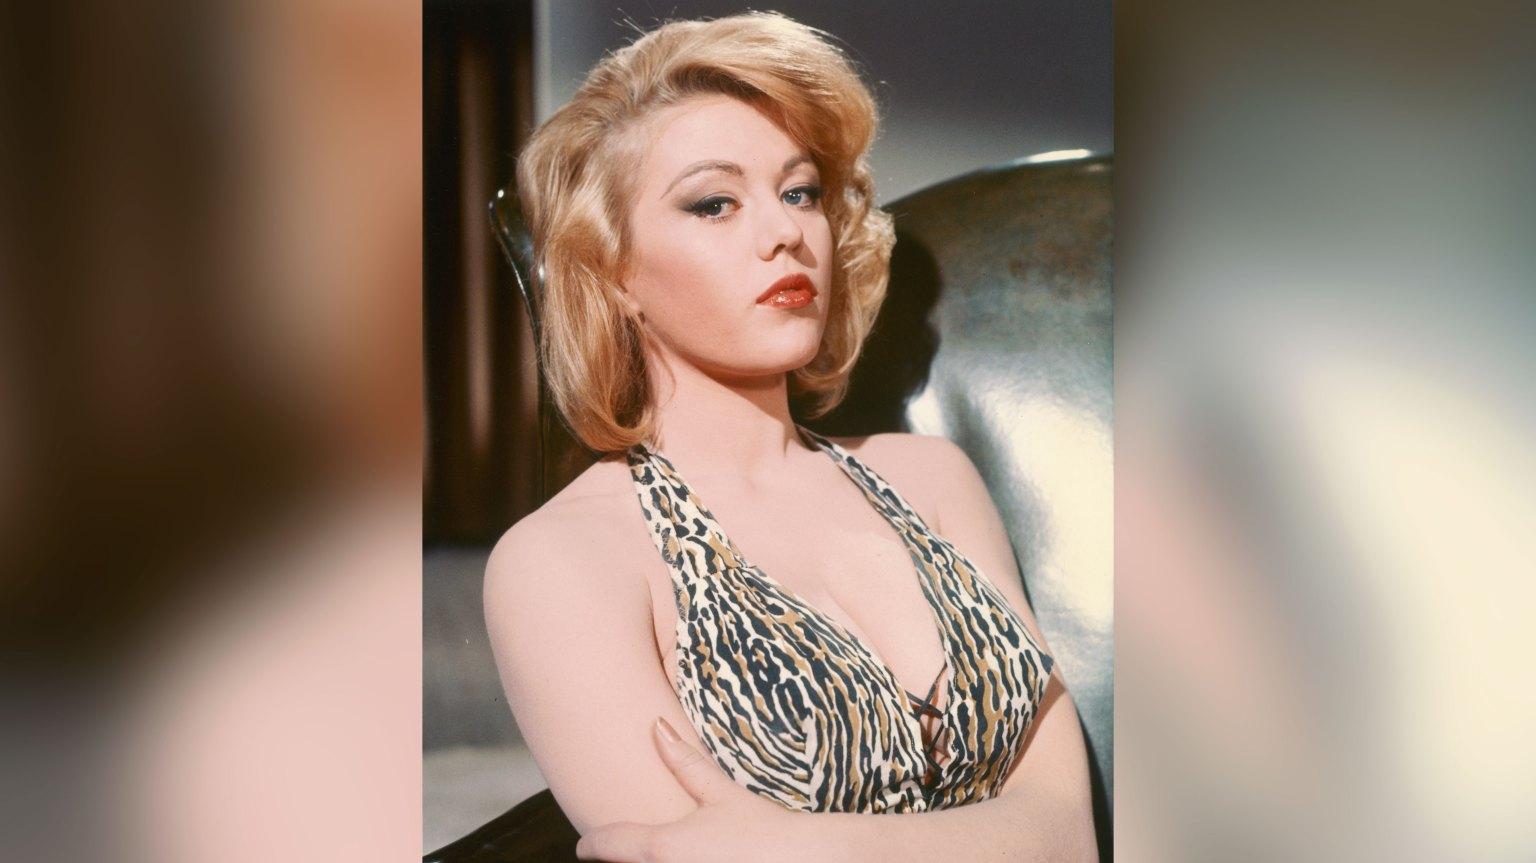 'Goldfinger' actress Margaret Nolan dead at 76